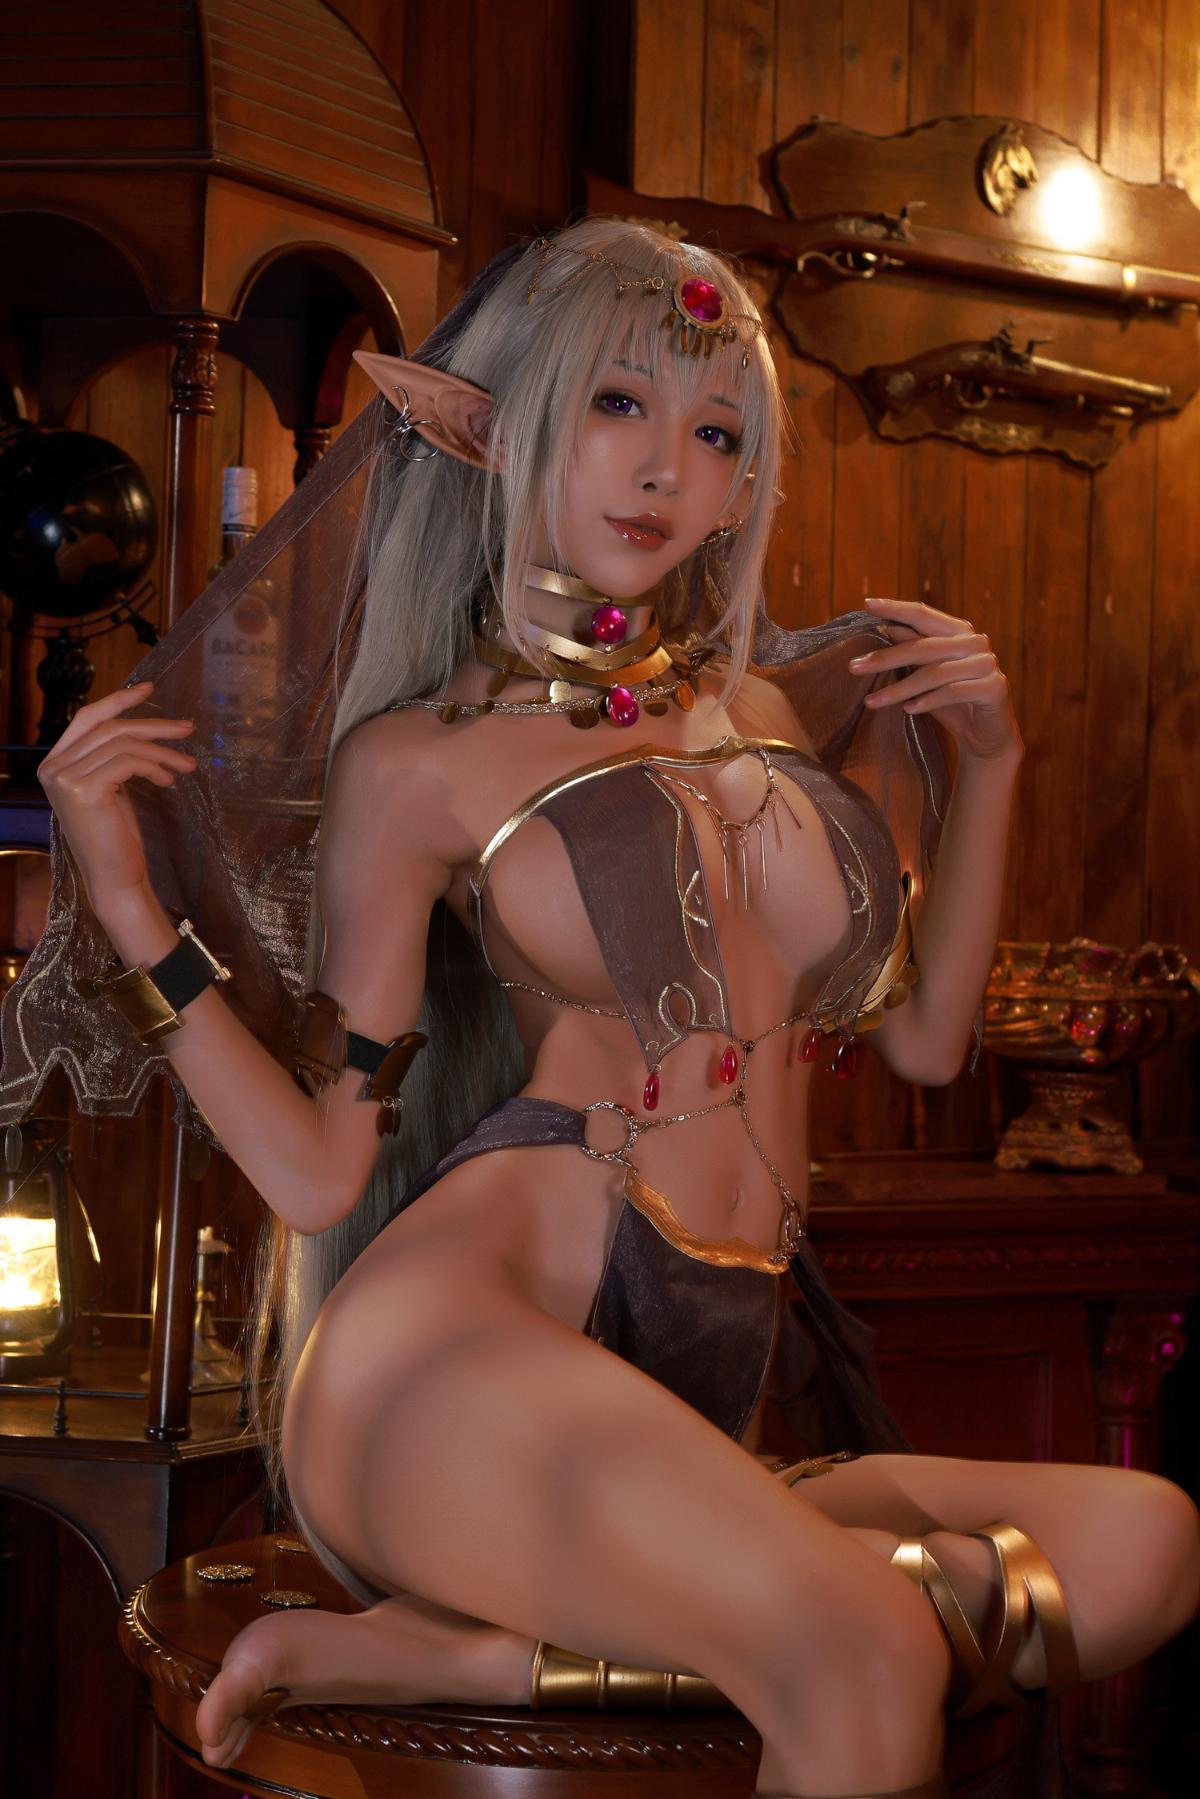 Tan Dancer Elf Succubus Cosplay by Aqua 5